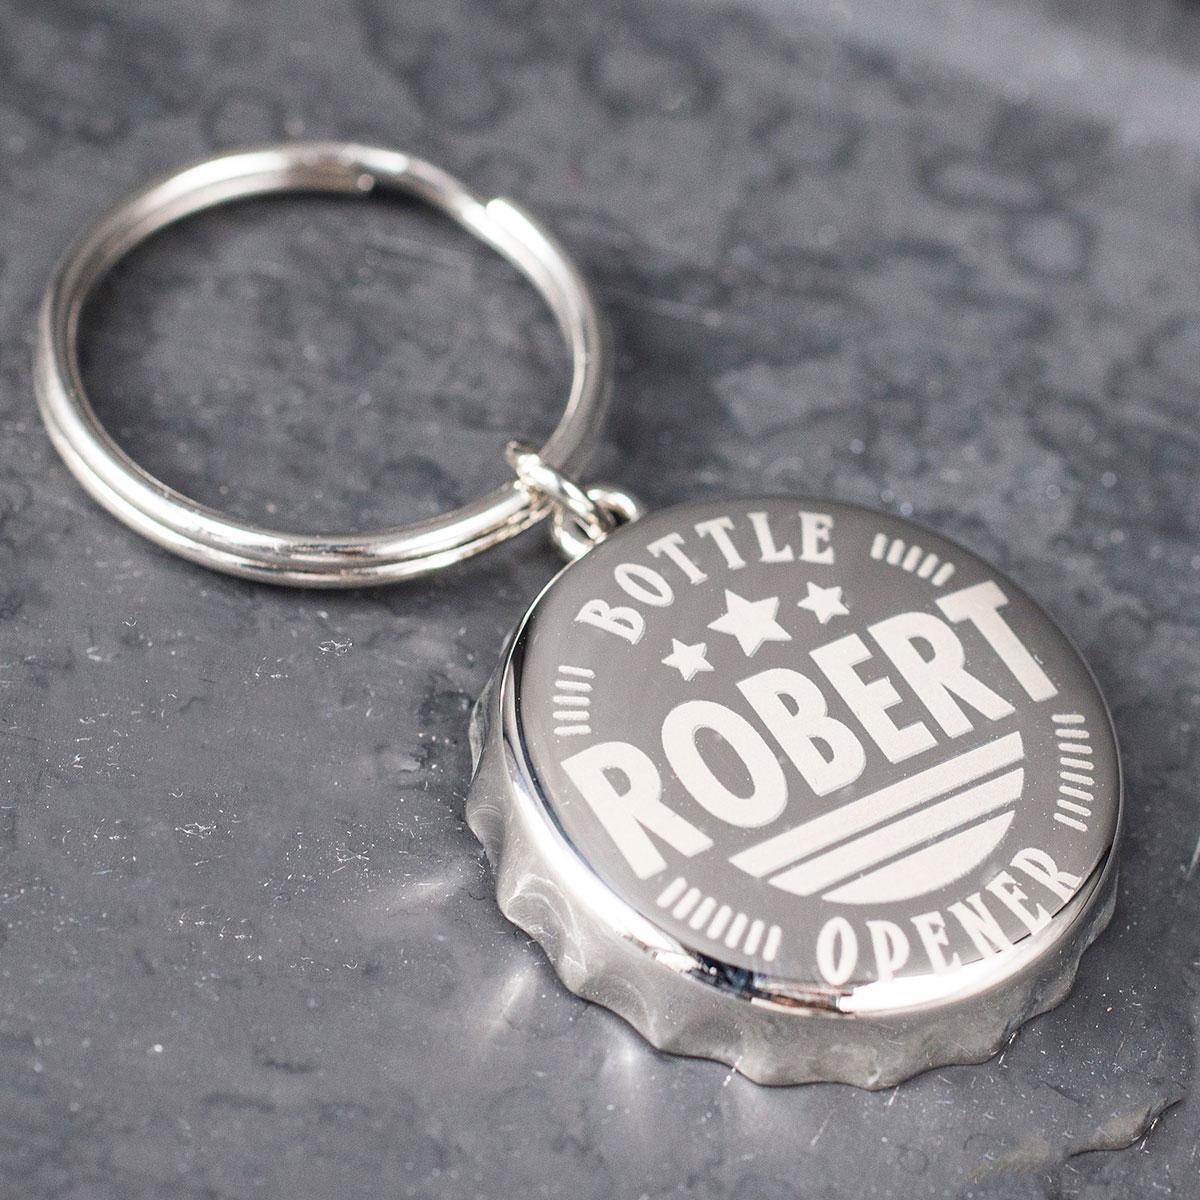 Personalised Bottle Top Keyring With Bottle Opener - Stars